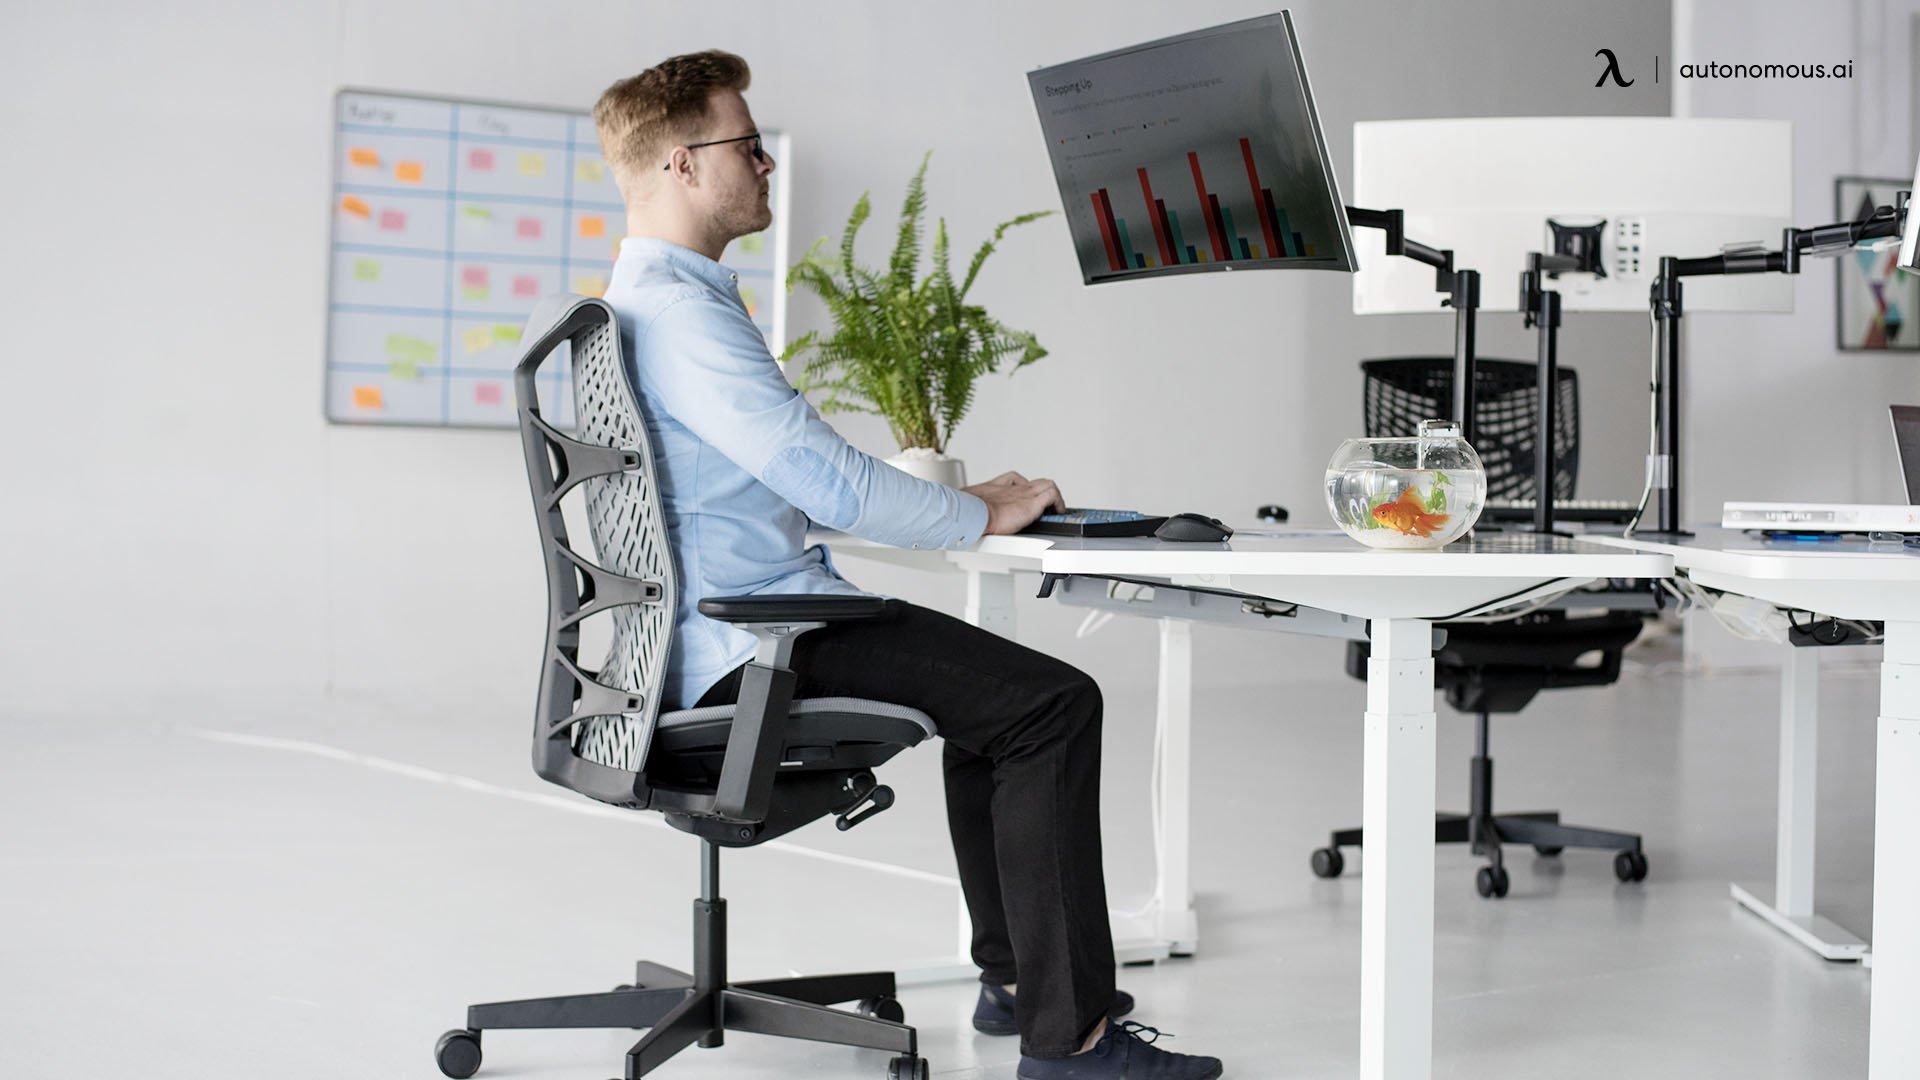 Work ergonomically